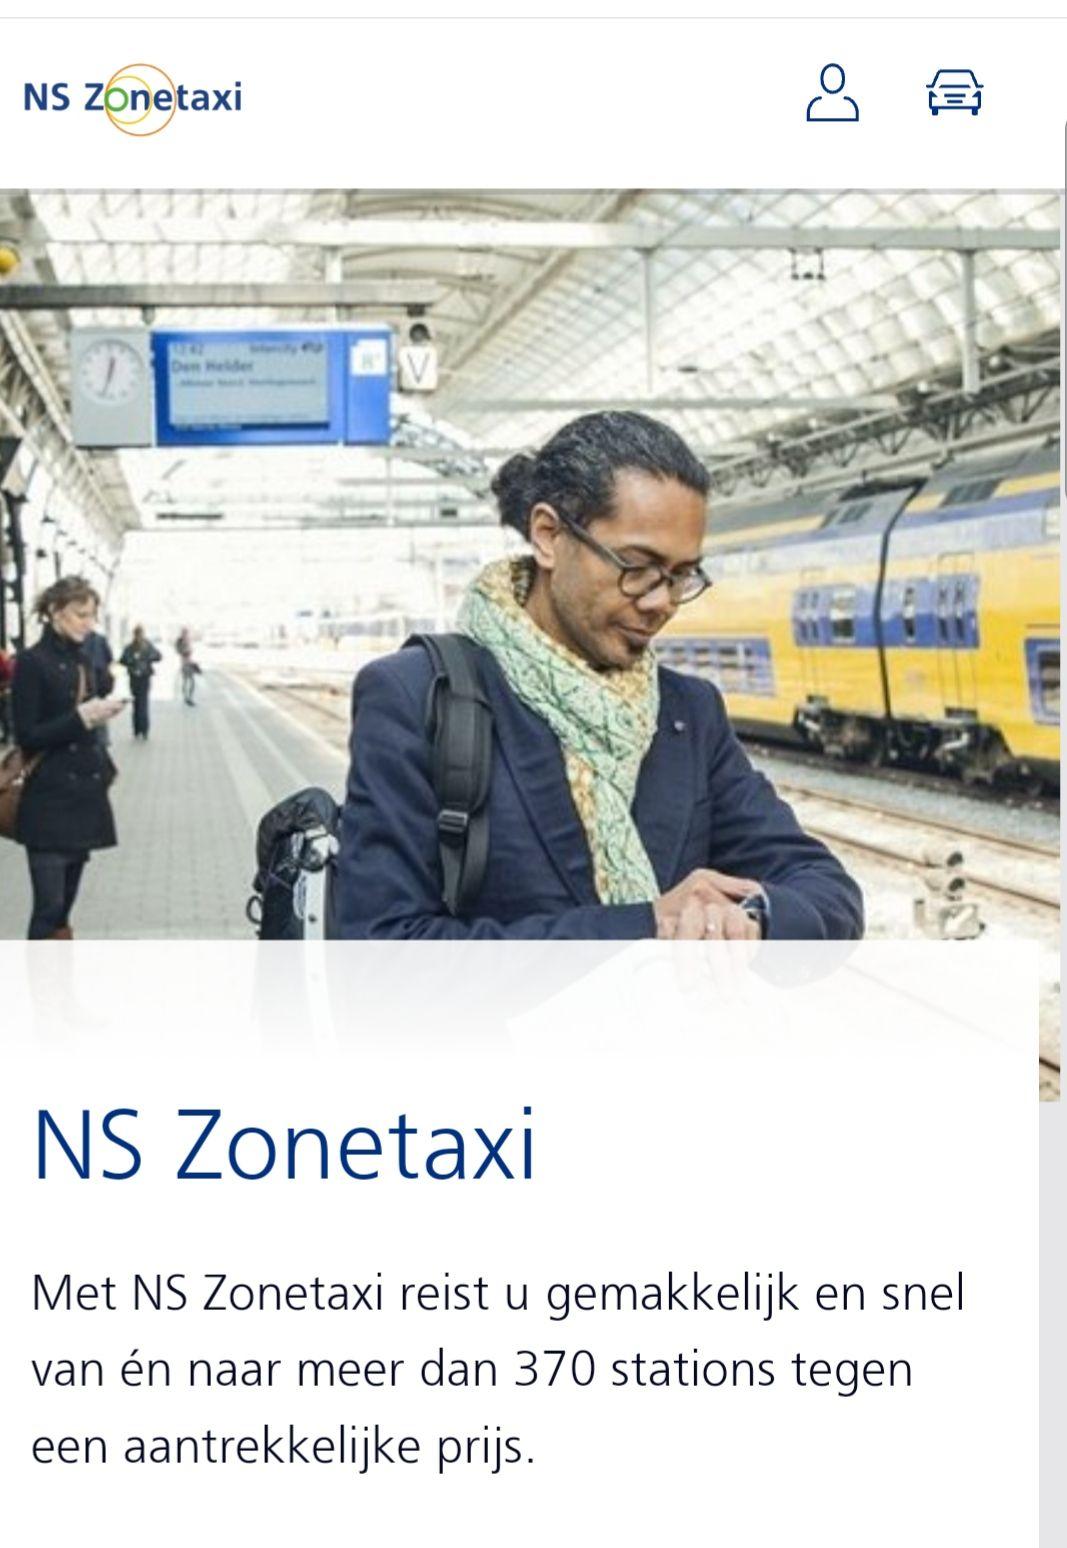 NS zonetaxi 5 euro korting